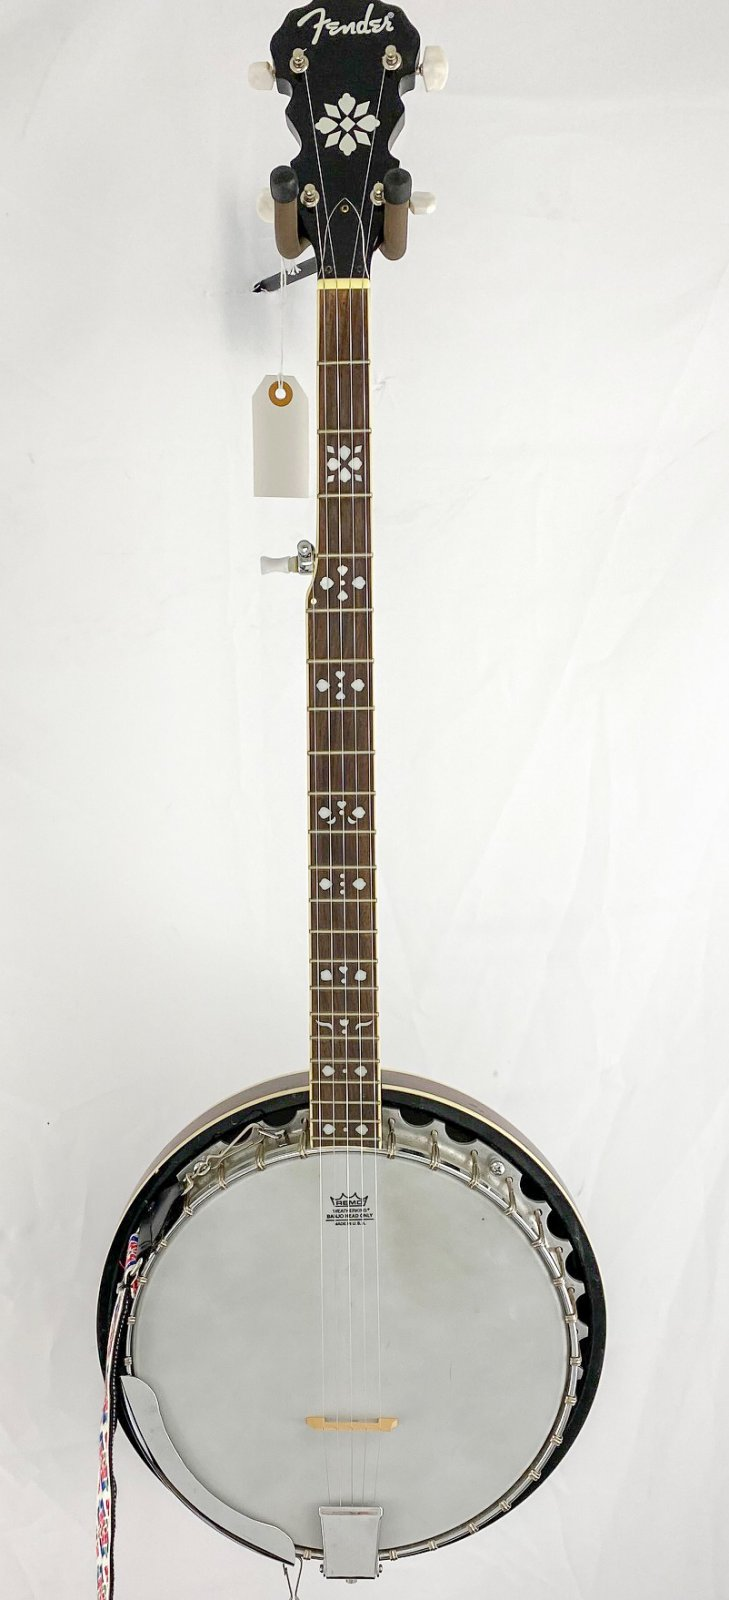 Fender FB-54 5-string banjo